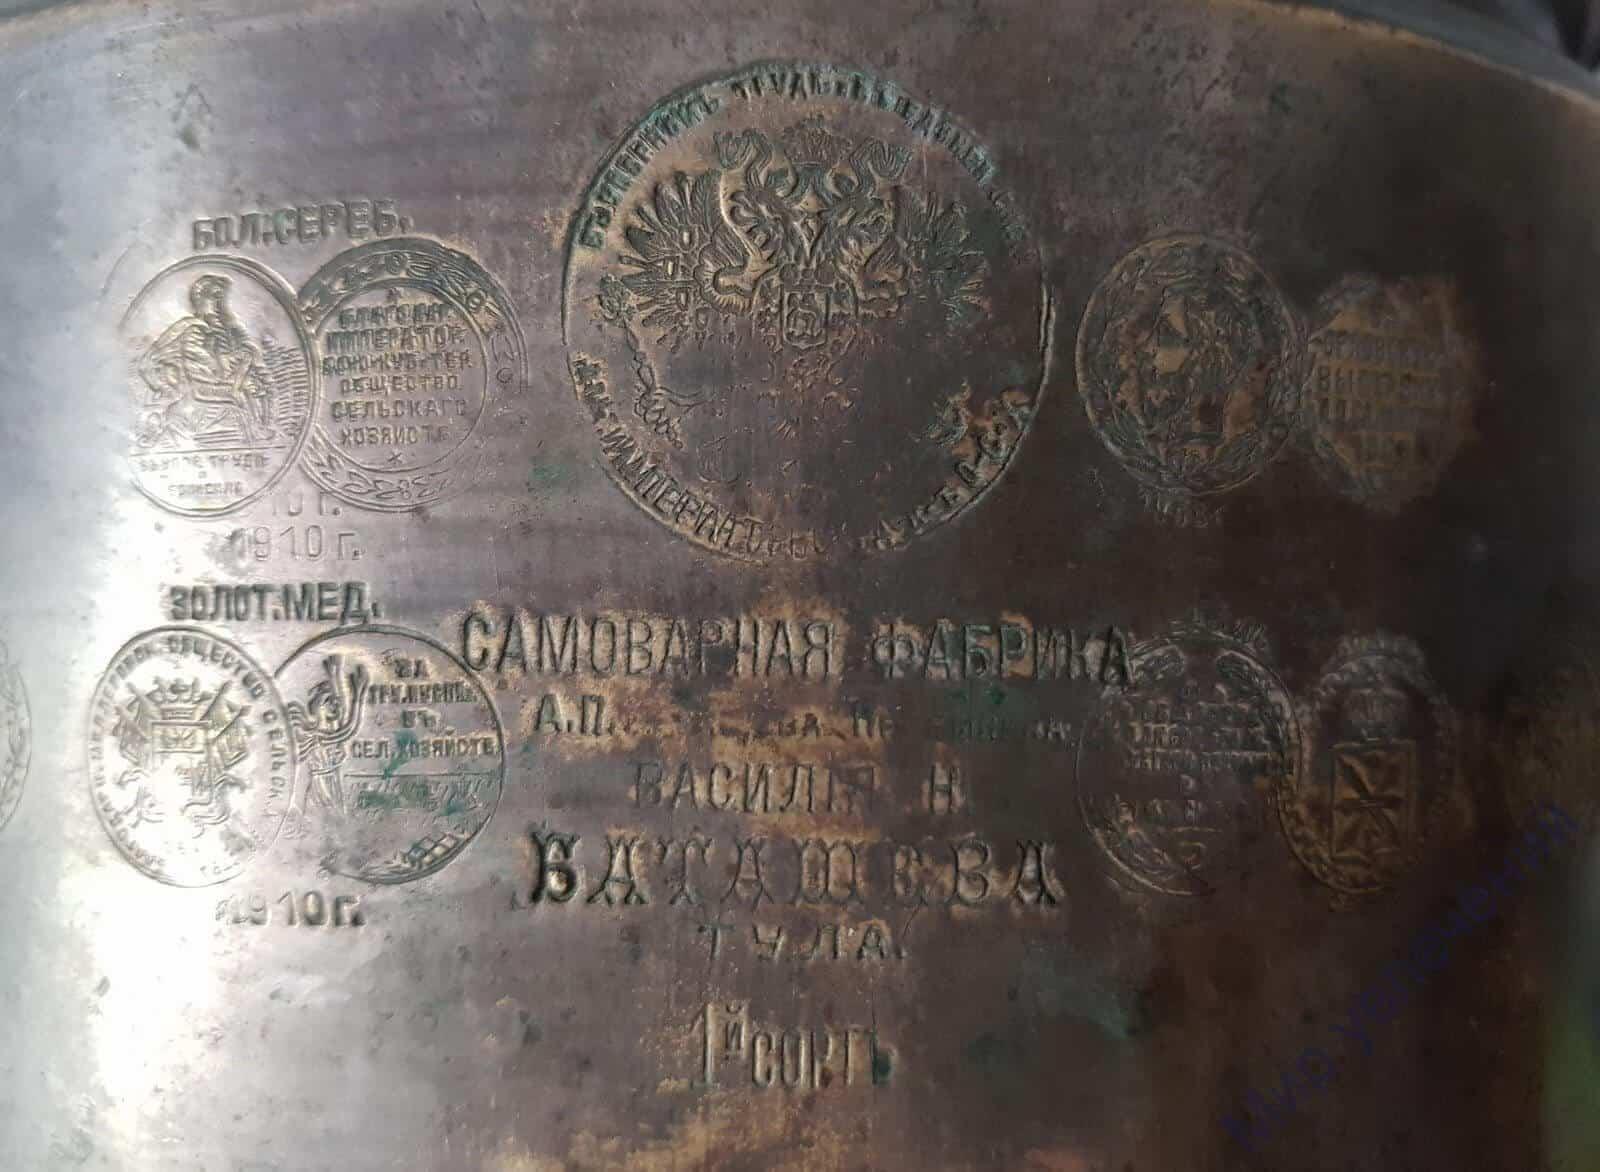 Fake Great Emblem on the samovar by A.P. Salishchev Works